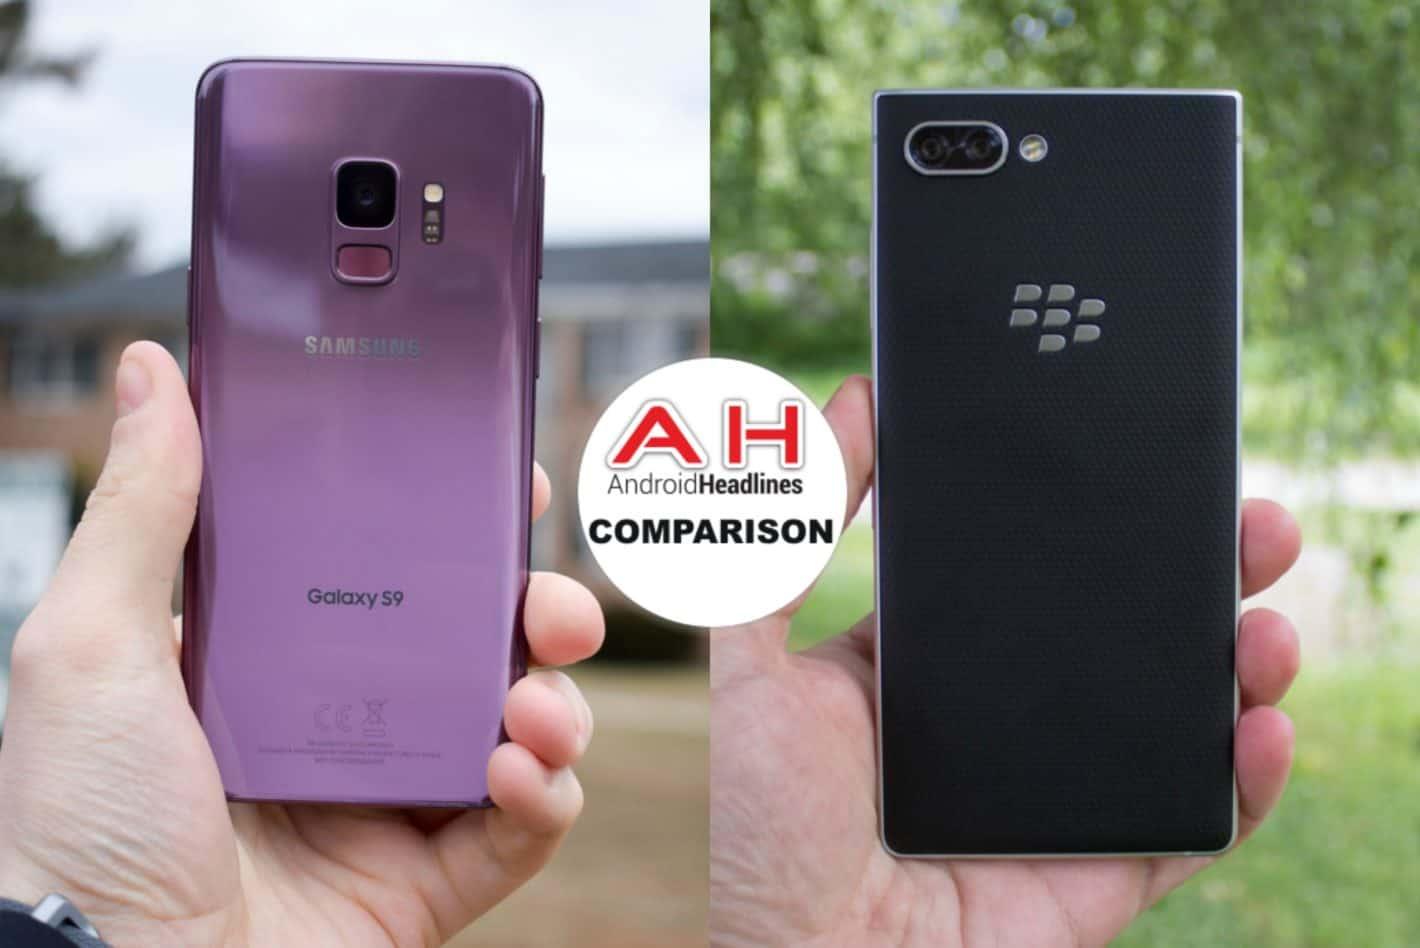 Galaxy S9 BB KEY2 Comp AH 01